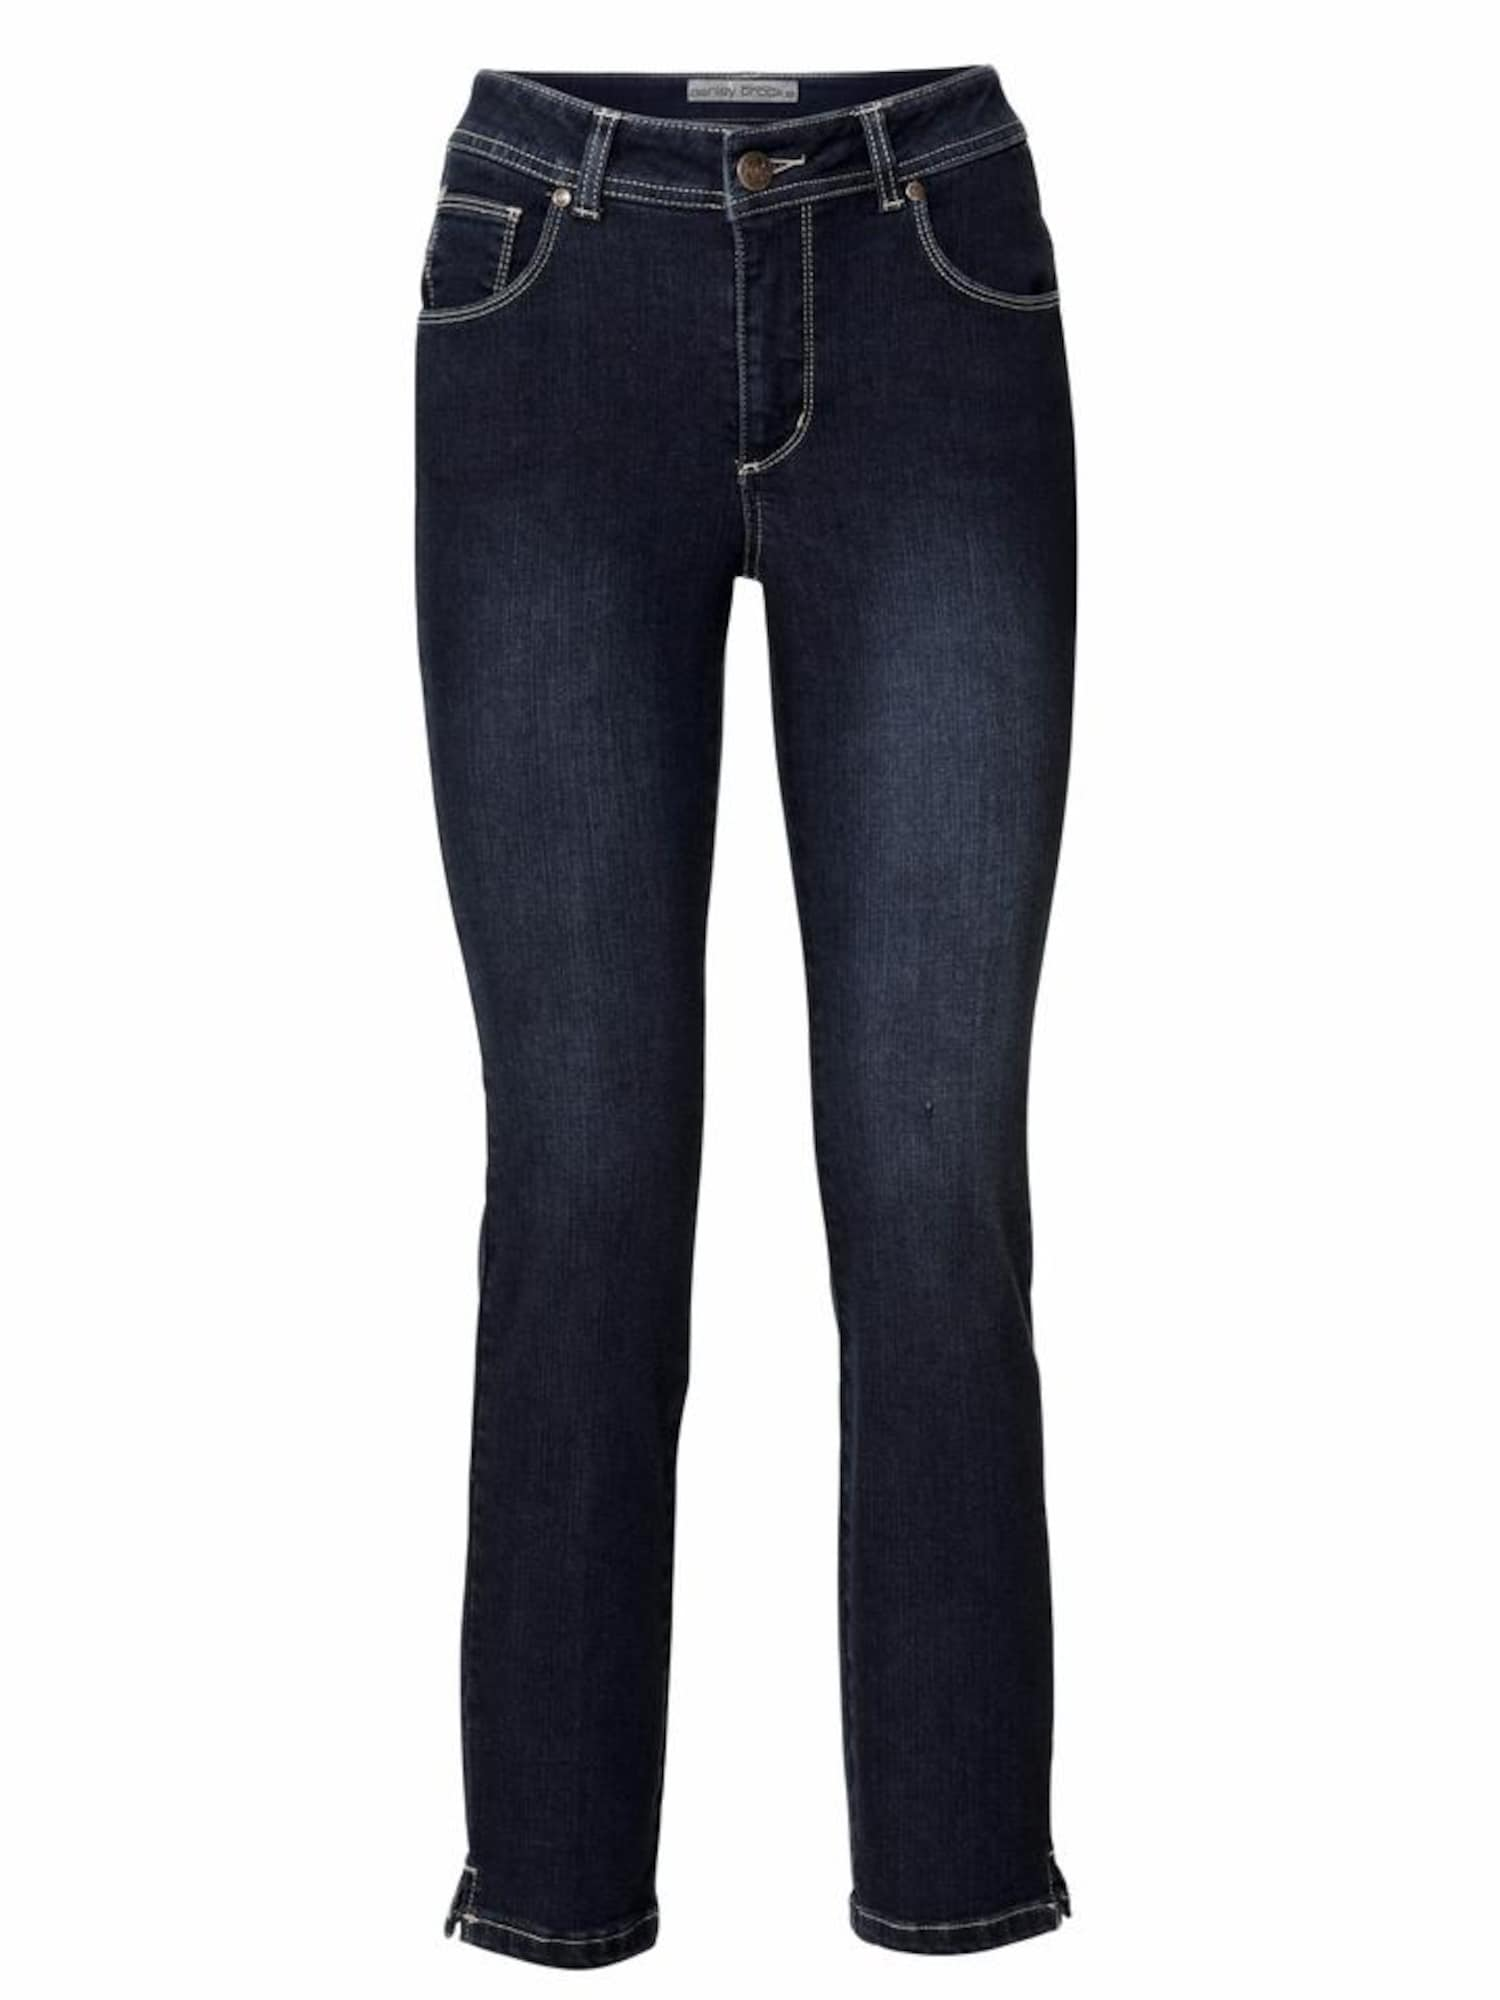 7/8-Jeans | Bekleidung > Jeans > 7/8-Jeans | heine